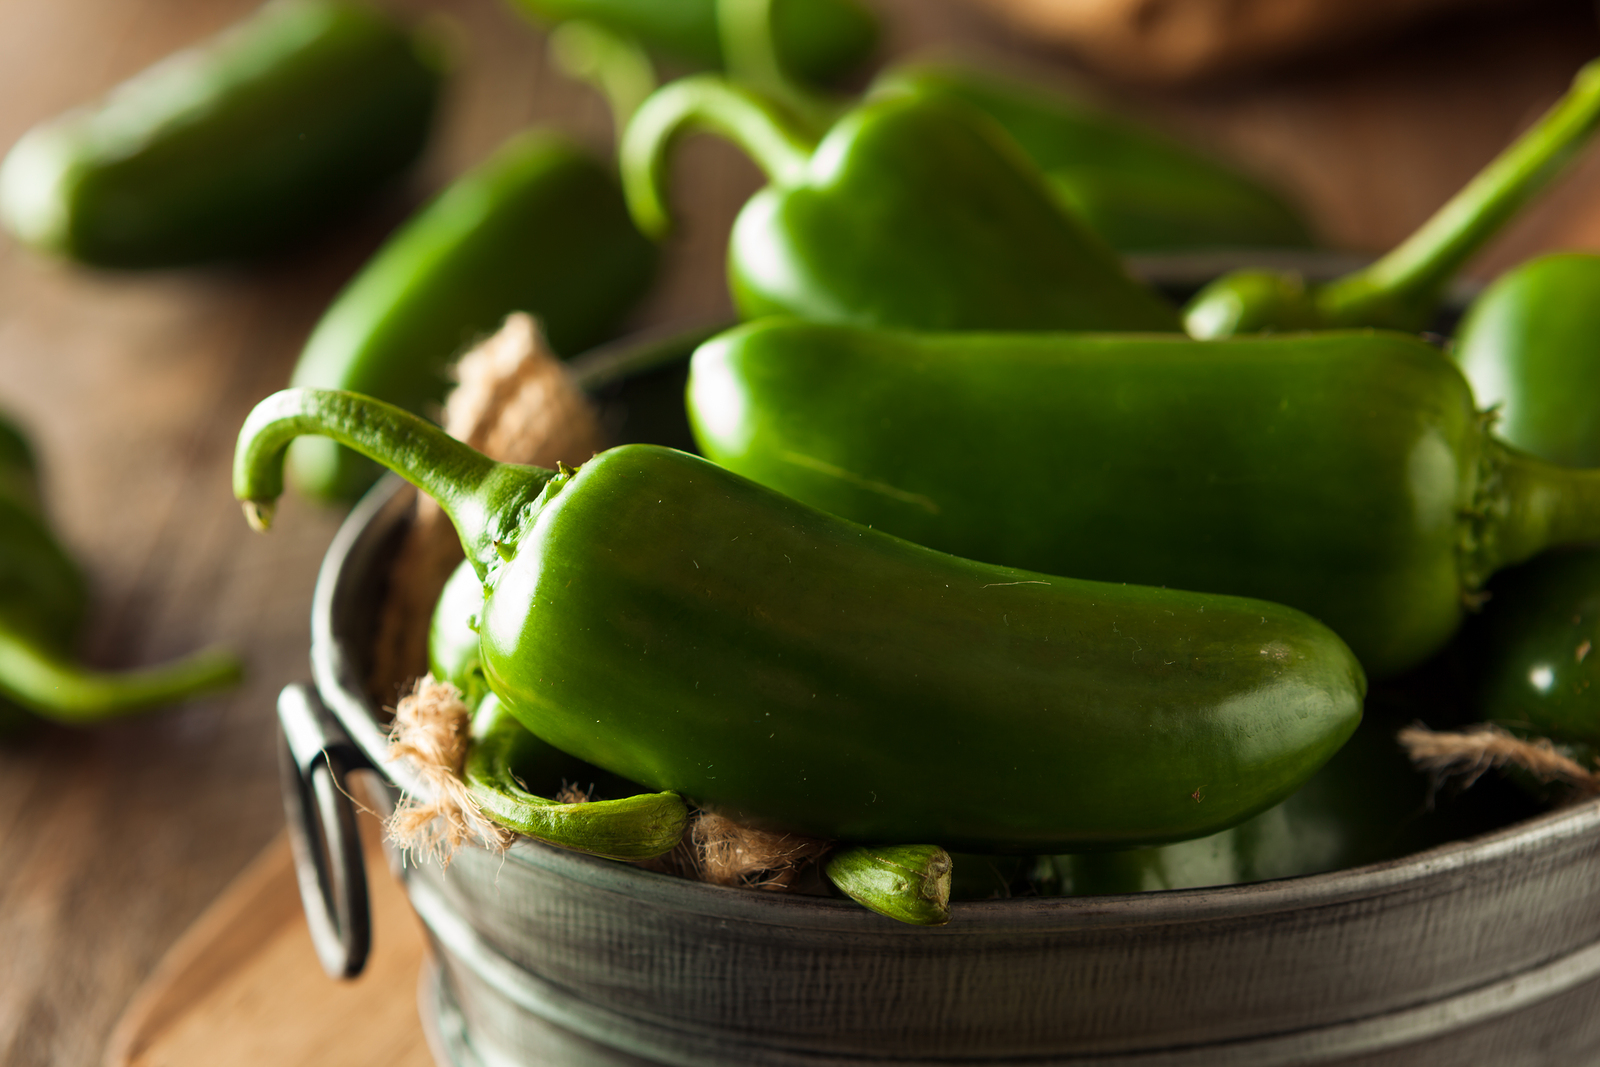 bigstock-Organic-Green-Jalapeno-Peppers-99285935 (1).jpg